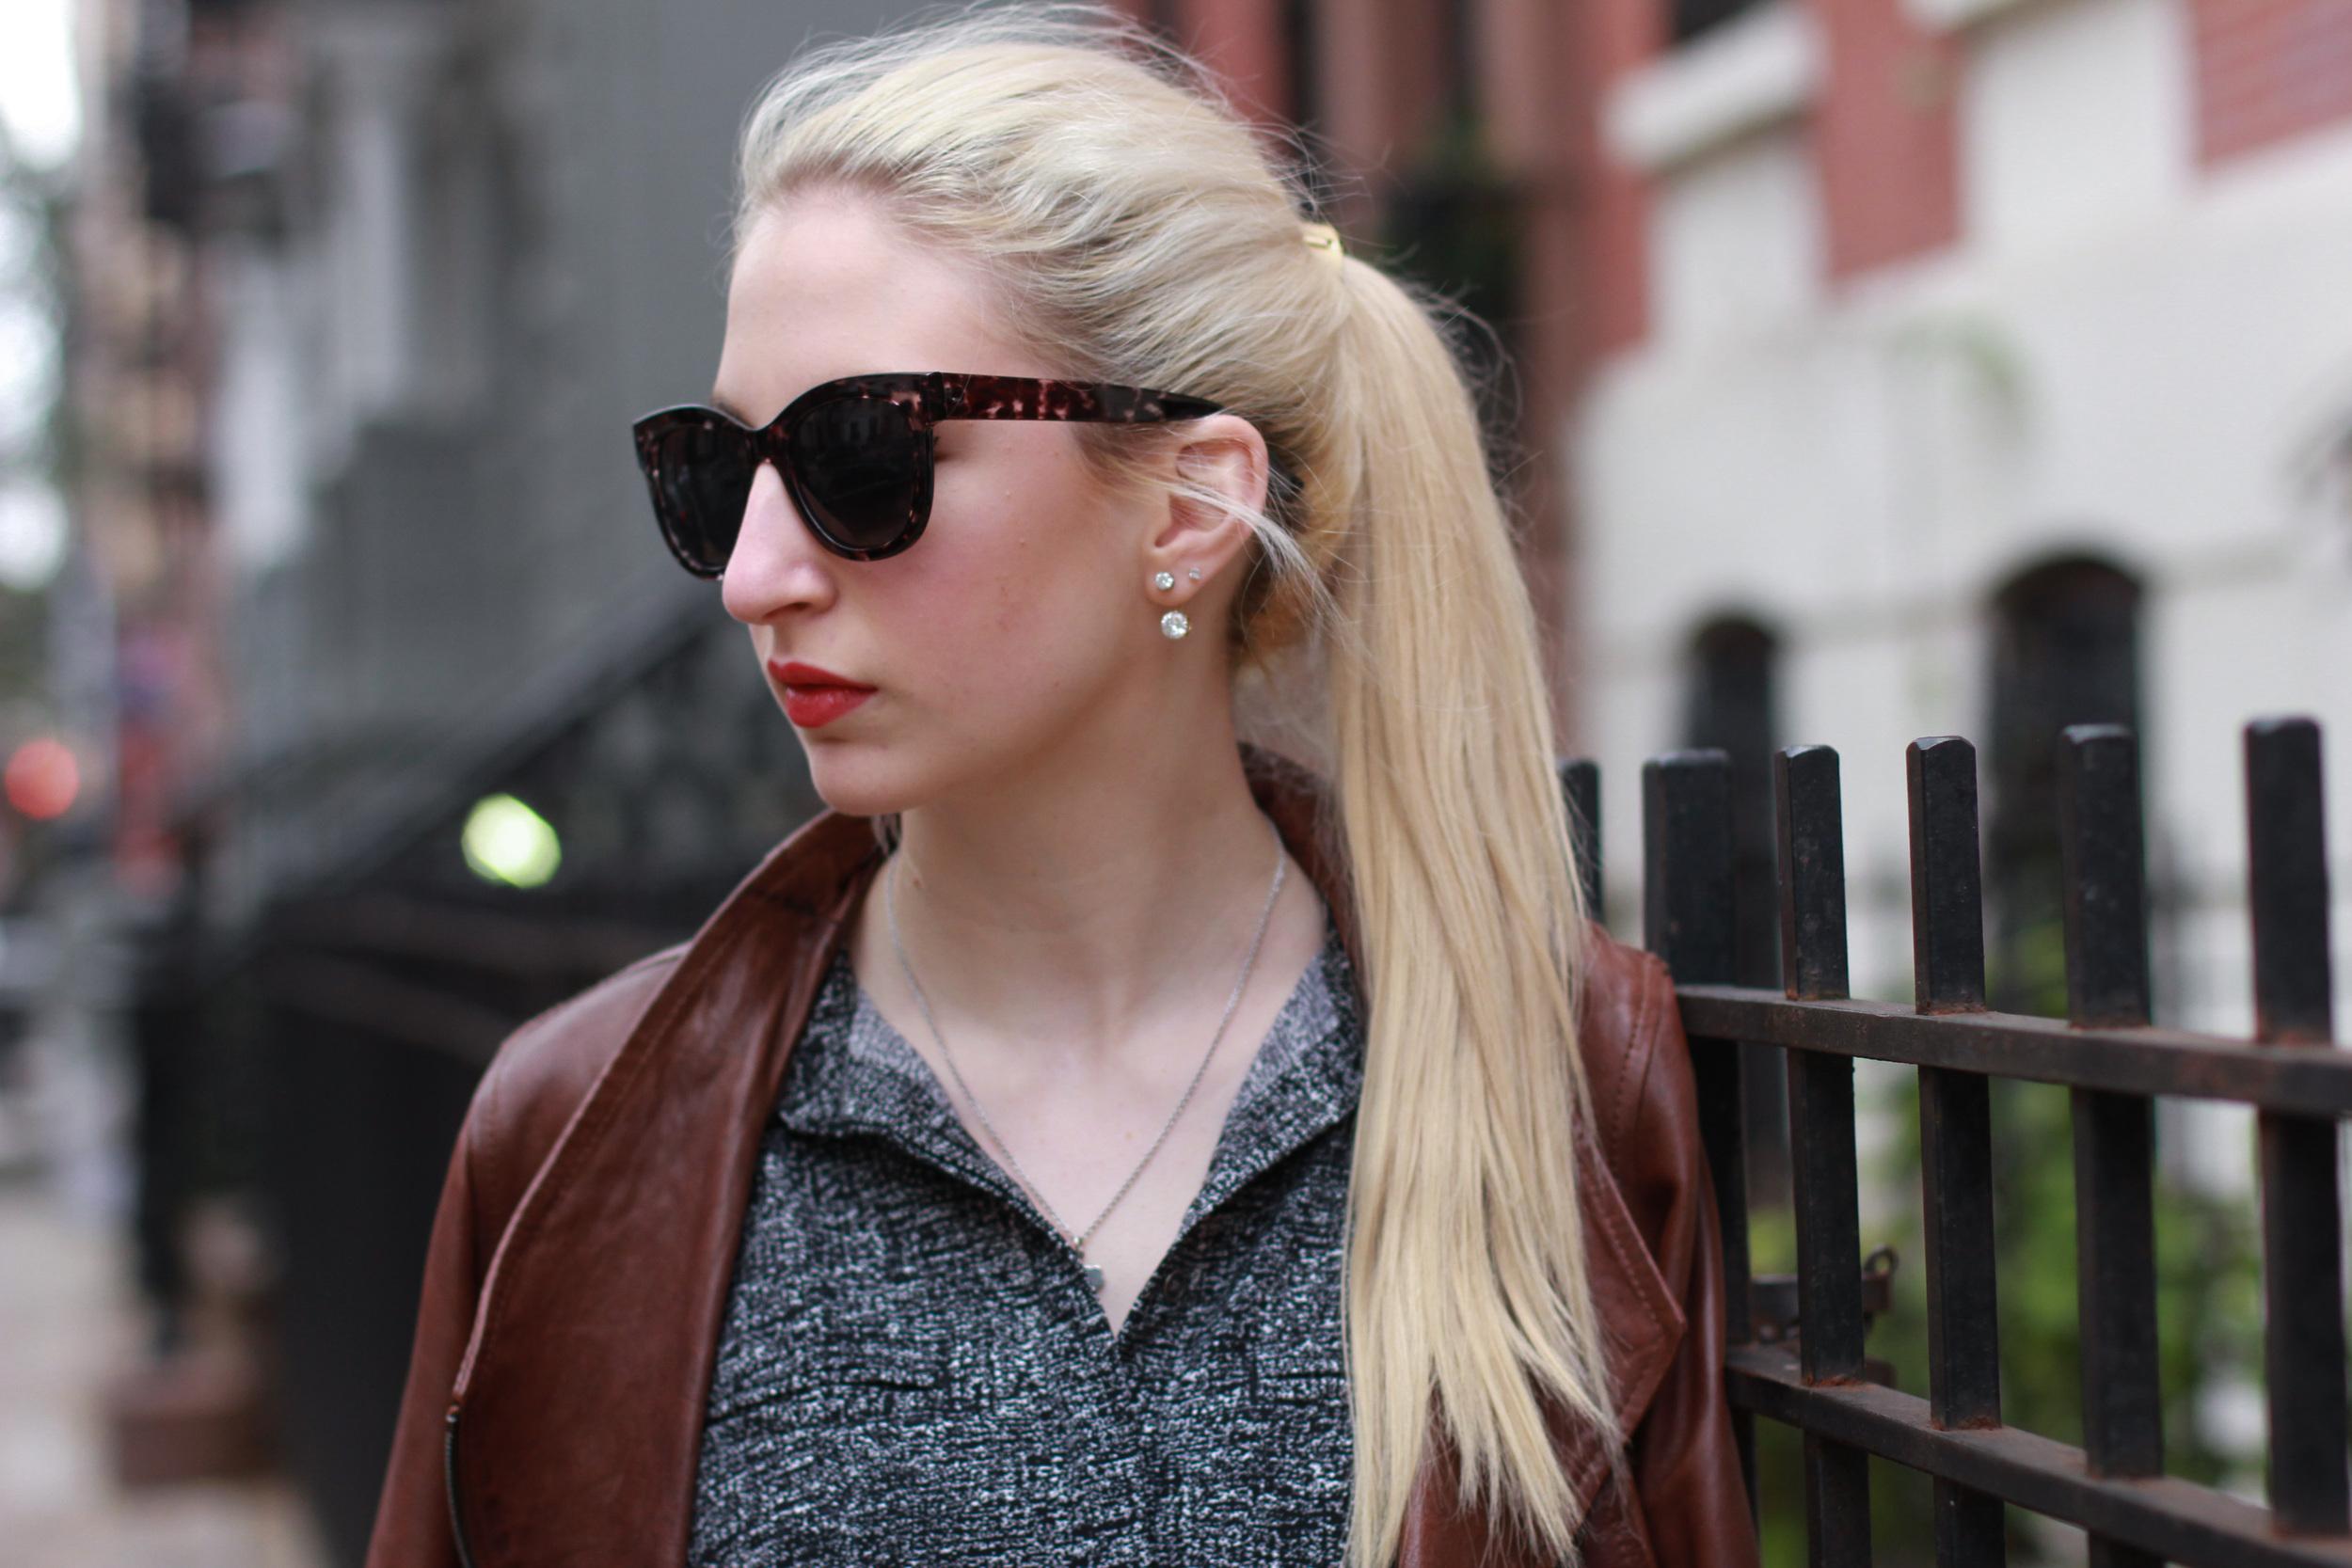 Lou & Grey shift dress, brown leather jacket, black ballet flats, gold ponytail holder, diamond drop earrings, clinique color pop lipstick in Poppy Pop.